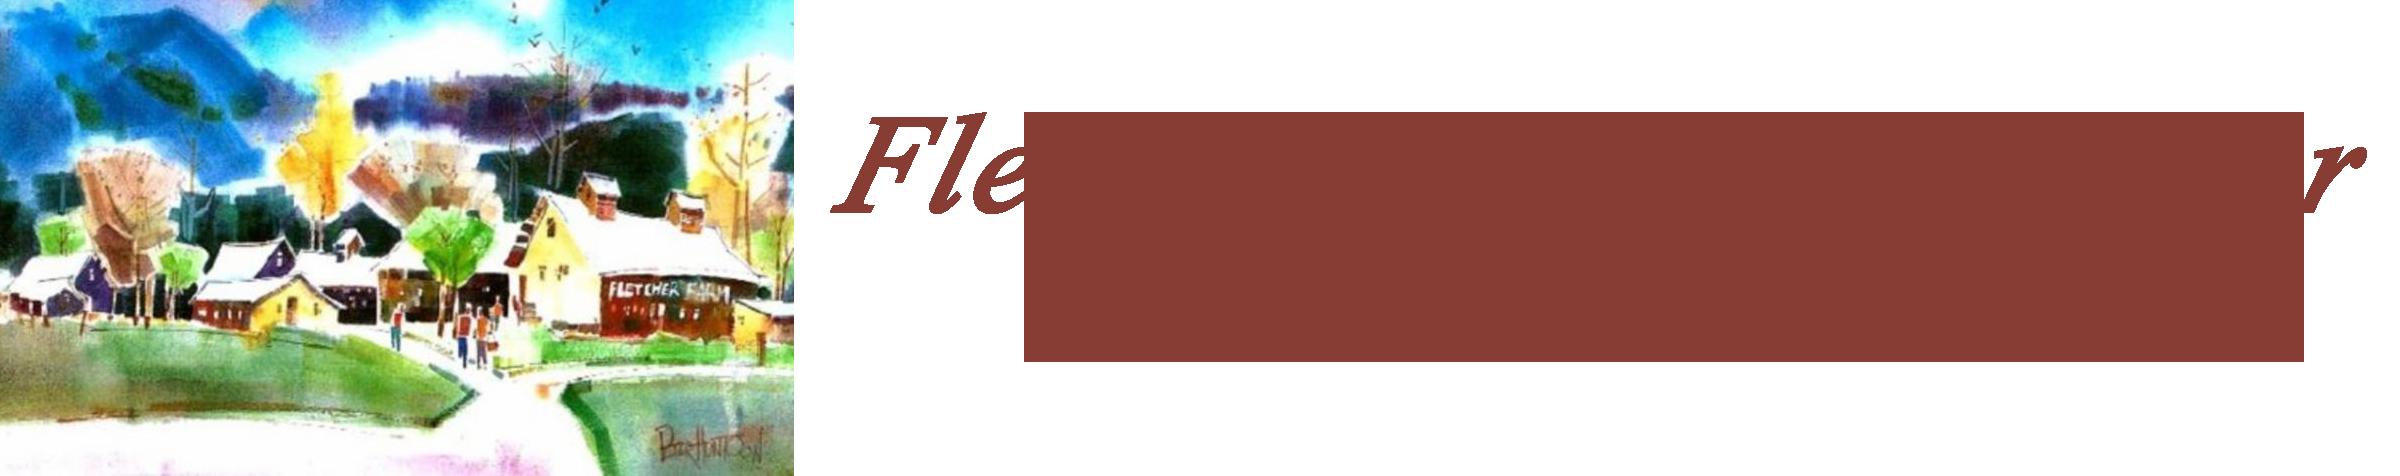 Fletcher Farm School